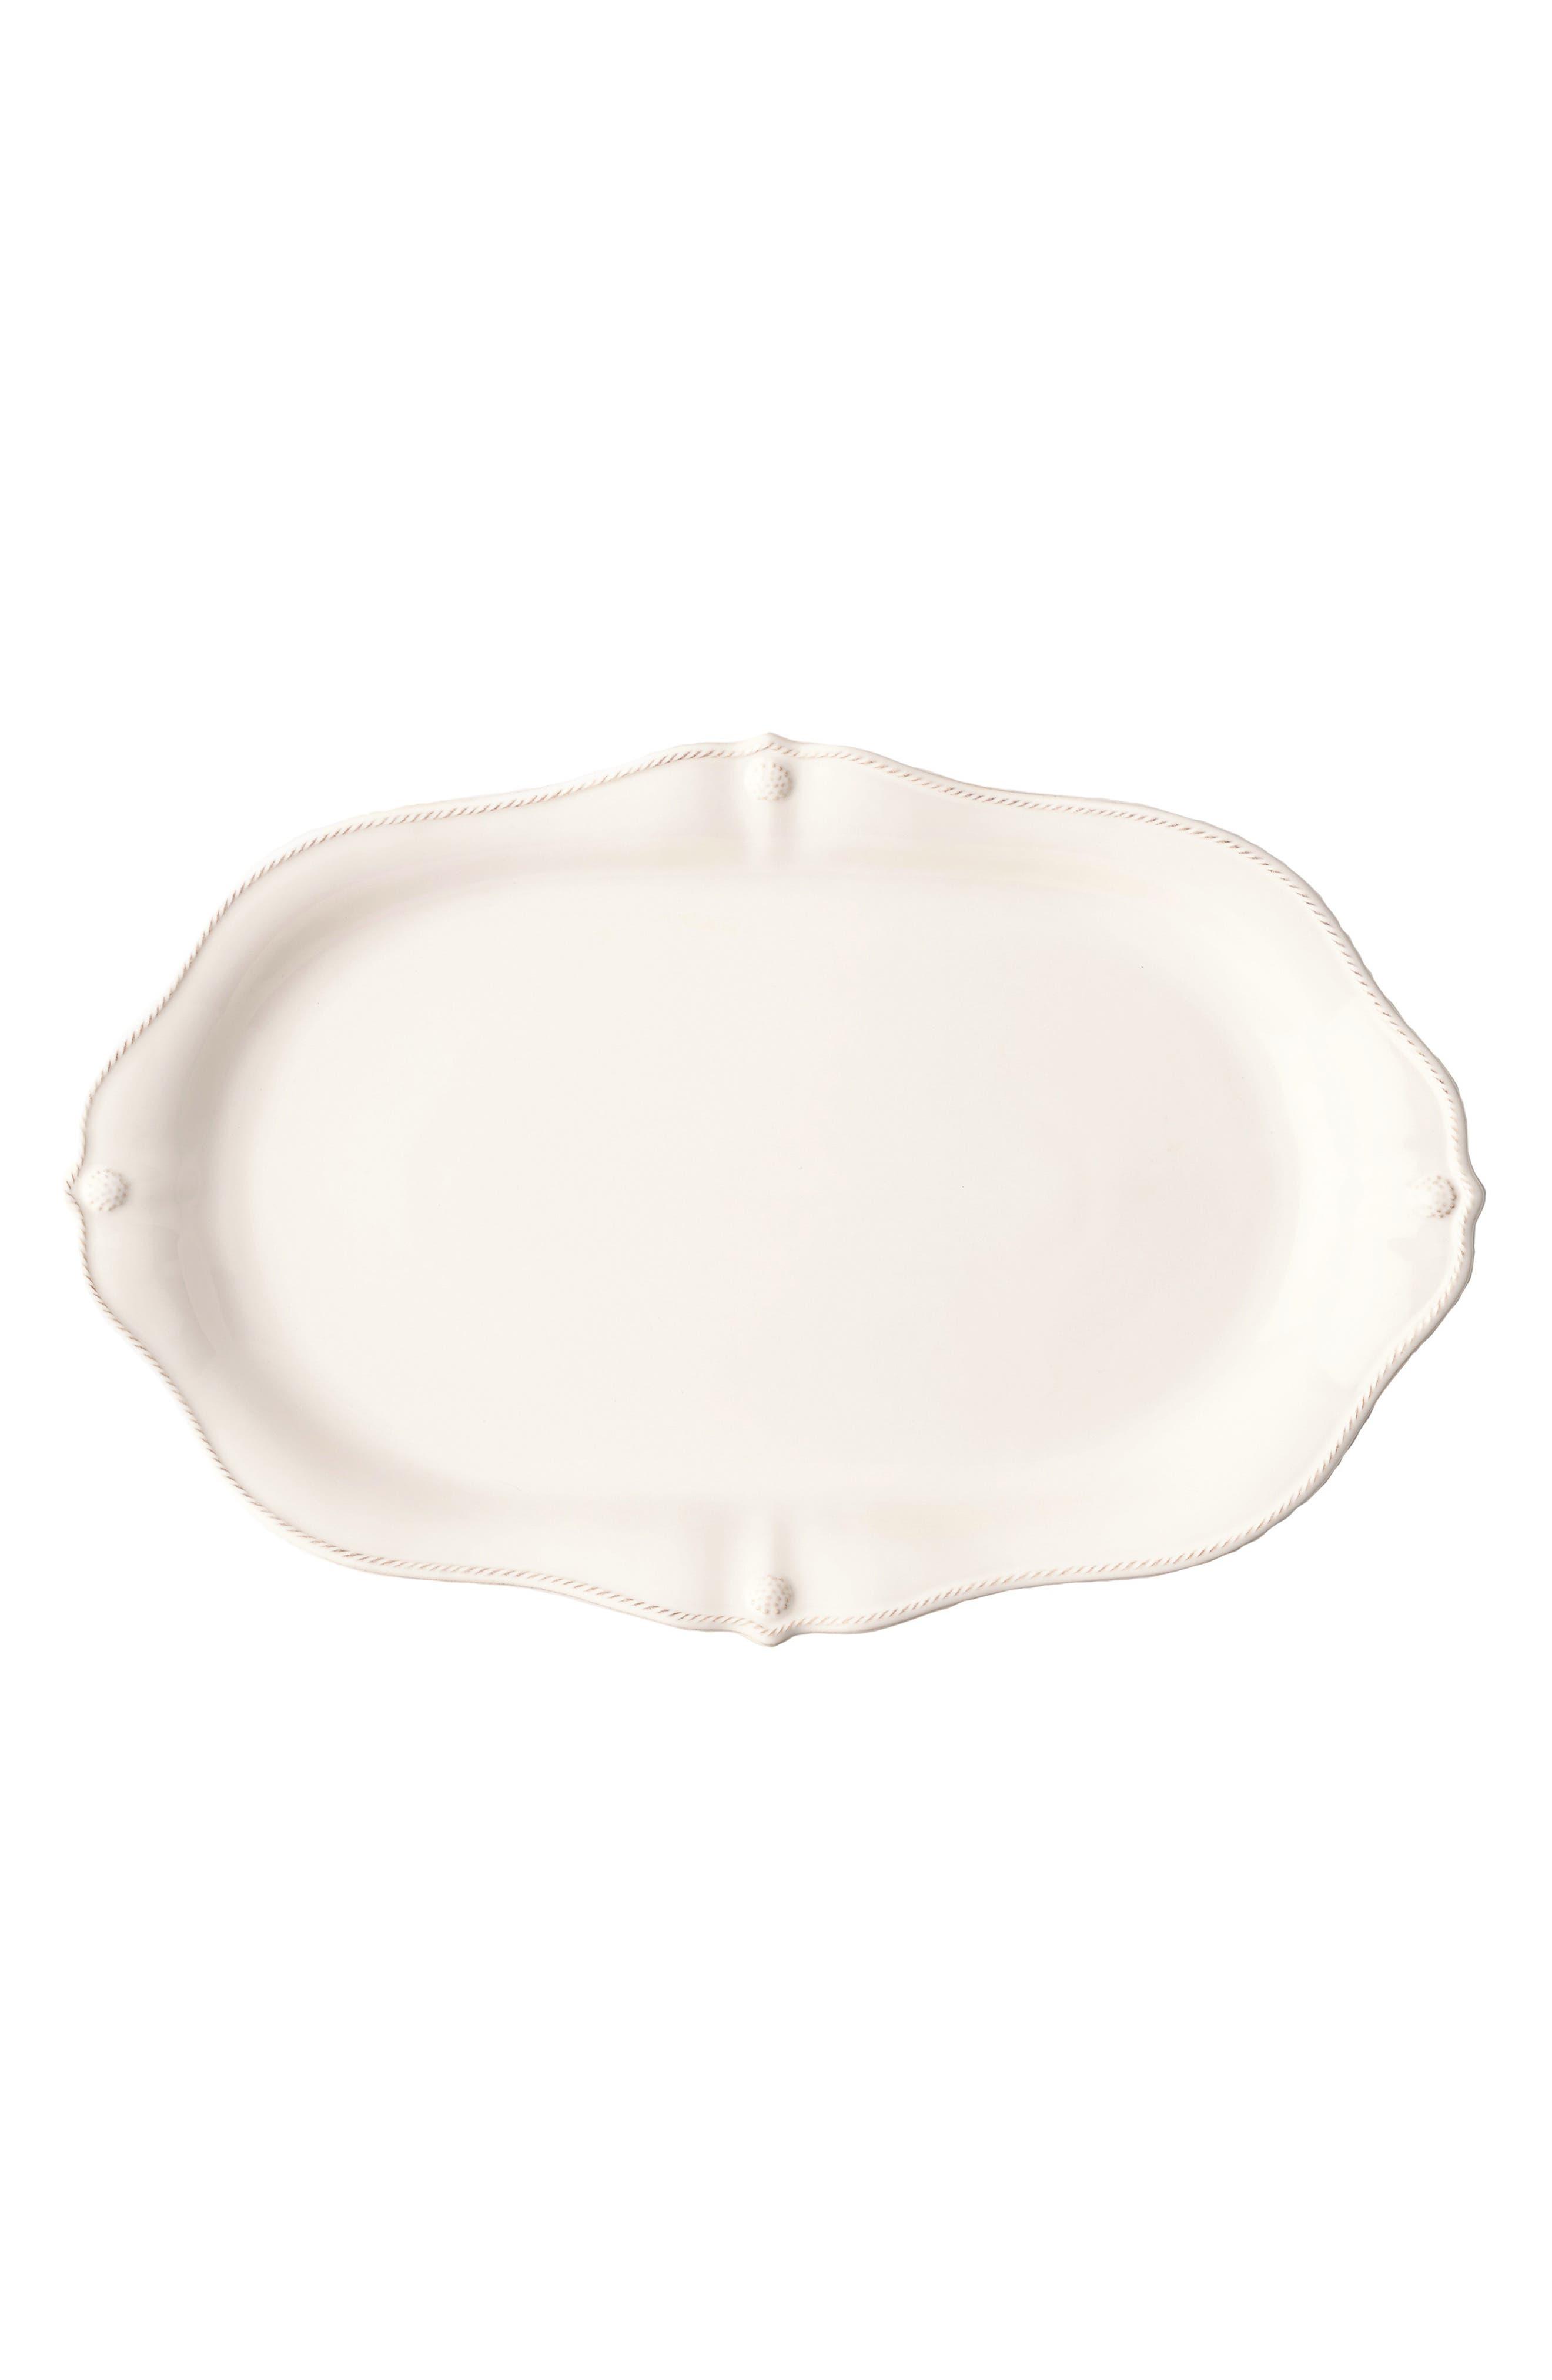 JULISKA,                             Berry & Thread Whitewash Scalloped Platter,                             Main thumbnail 1, color,                             WHITEWASH